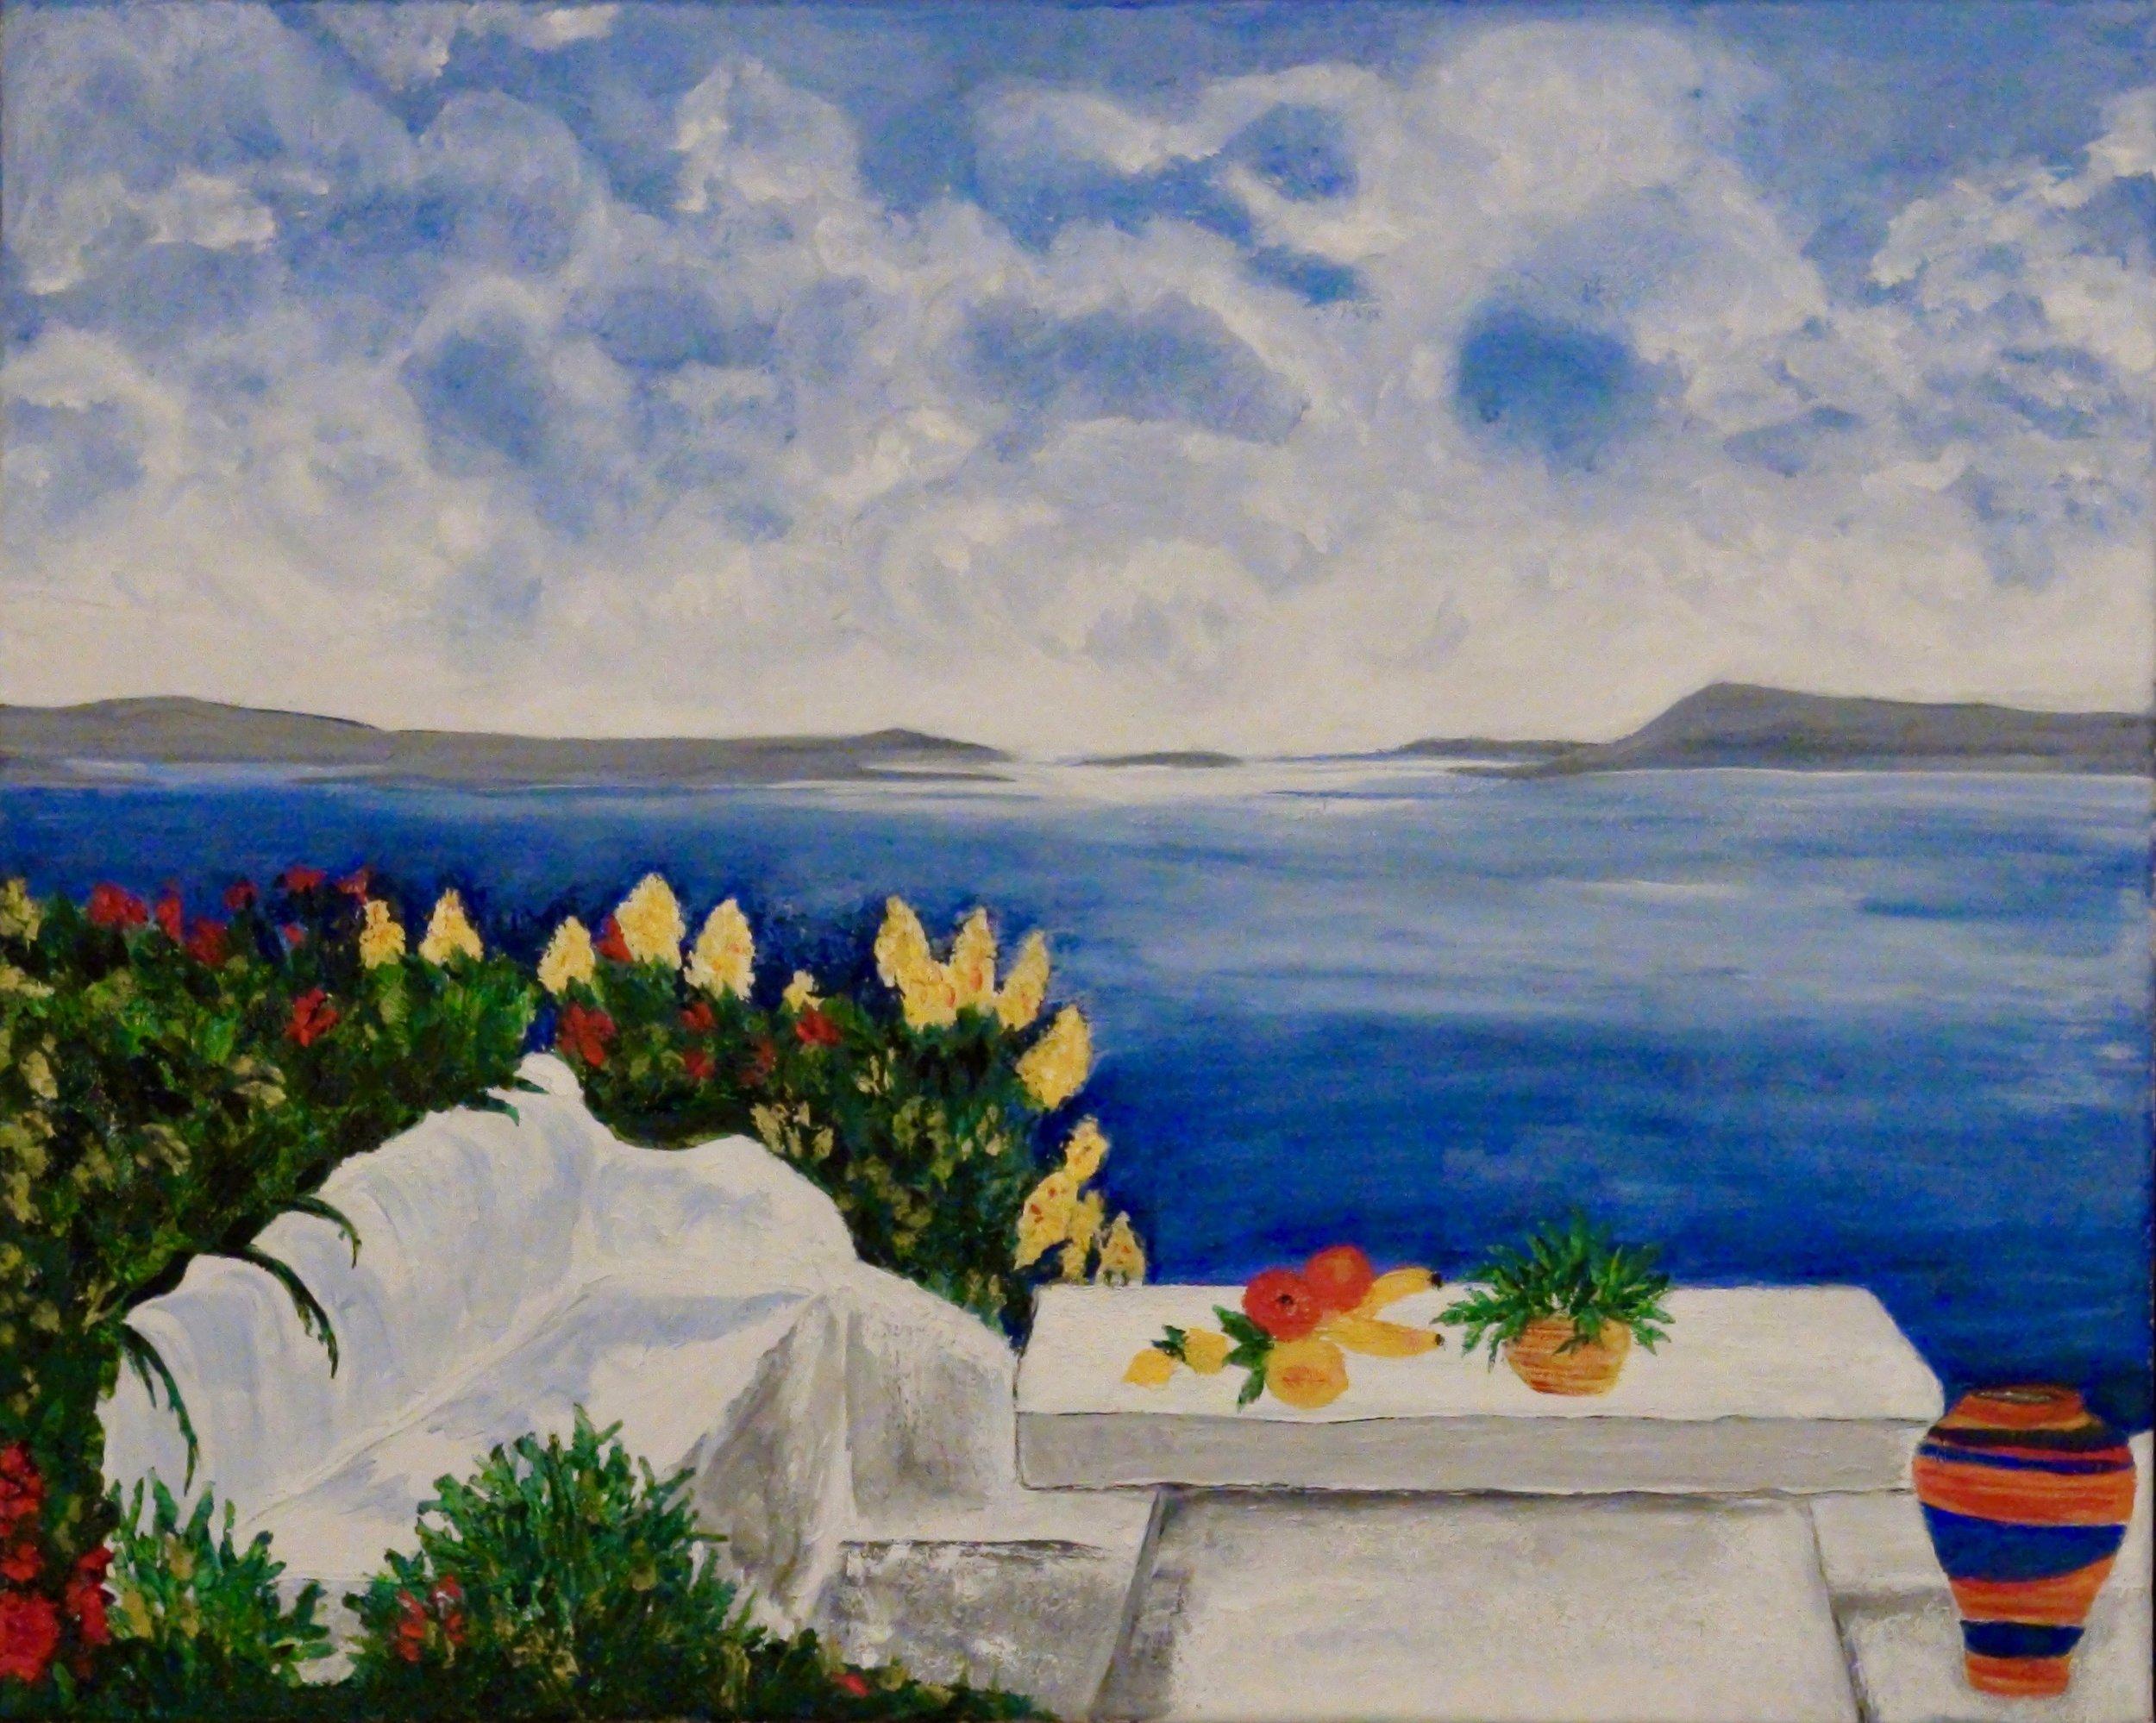 """Santorini Idyll"" - Oil, 20""x 16"" - 2016"